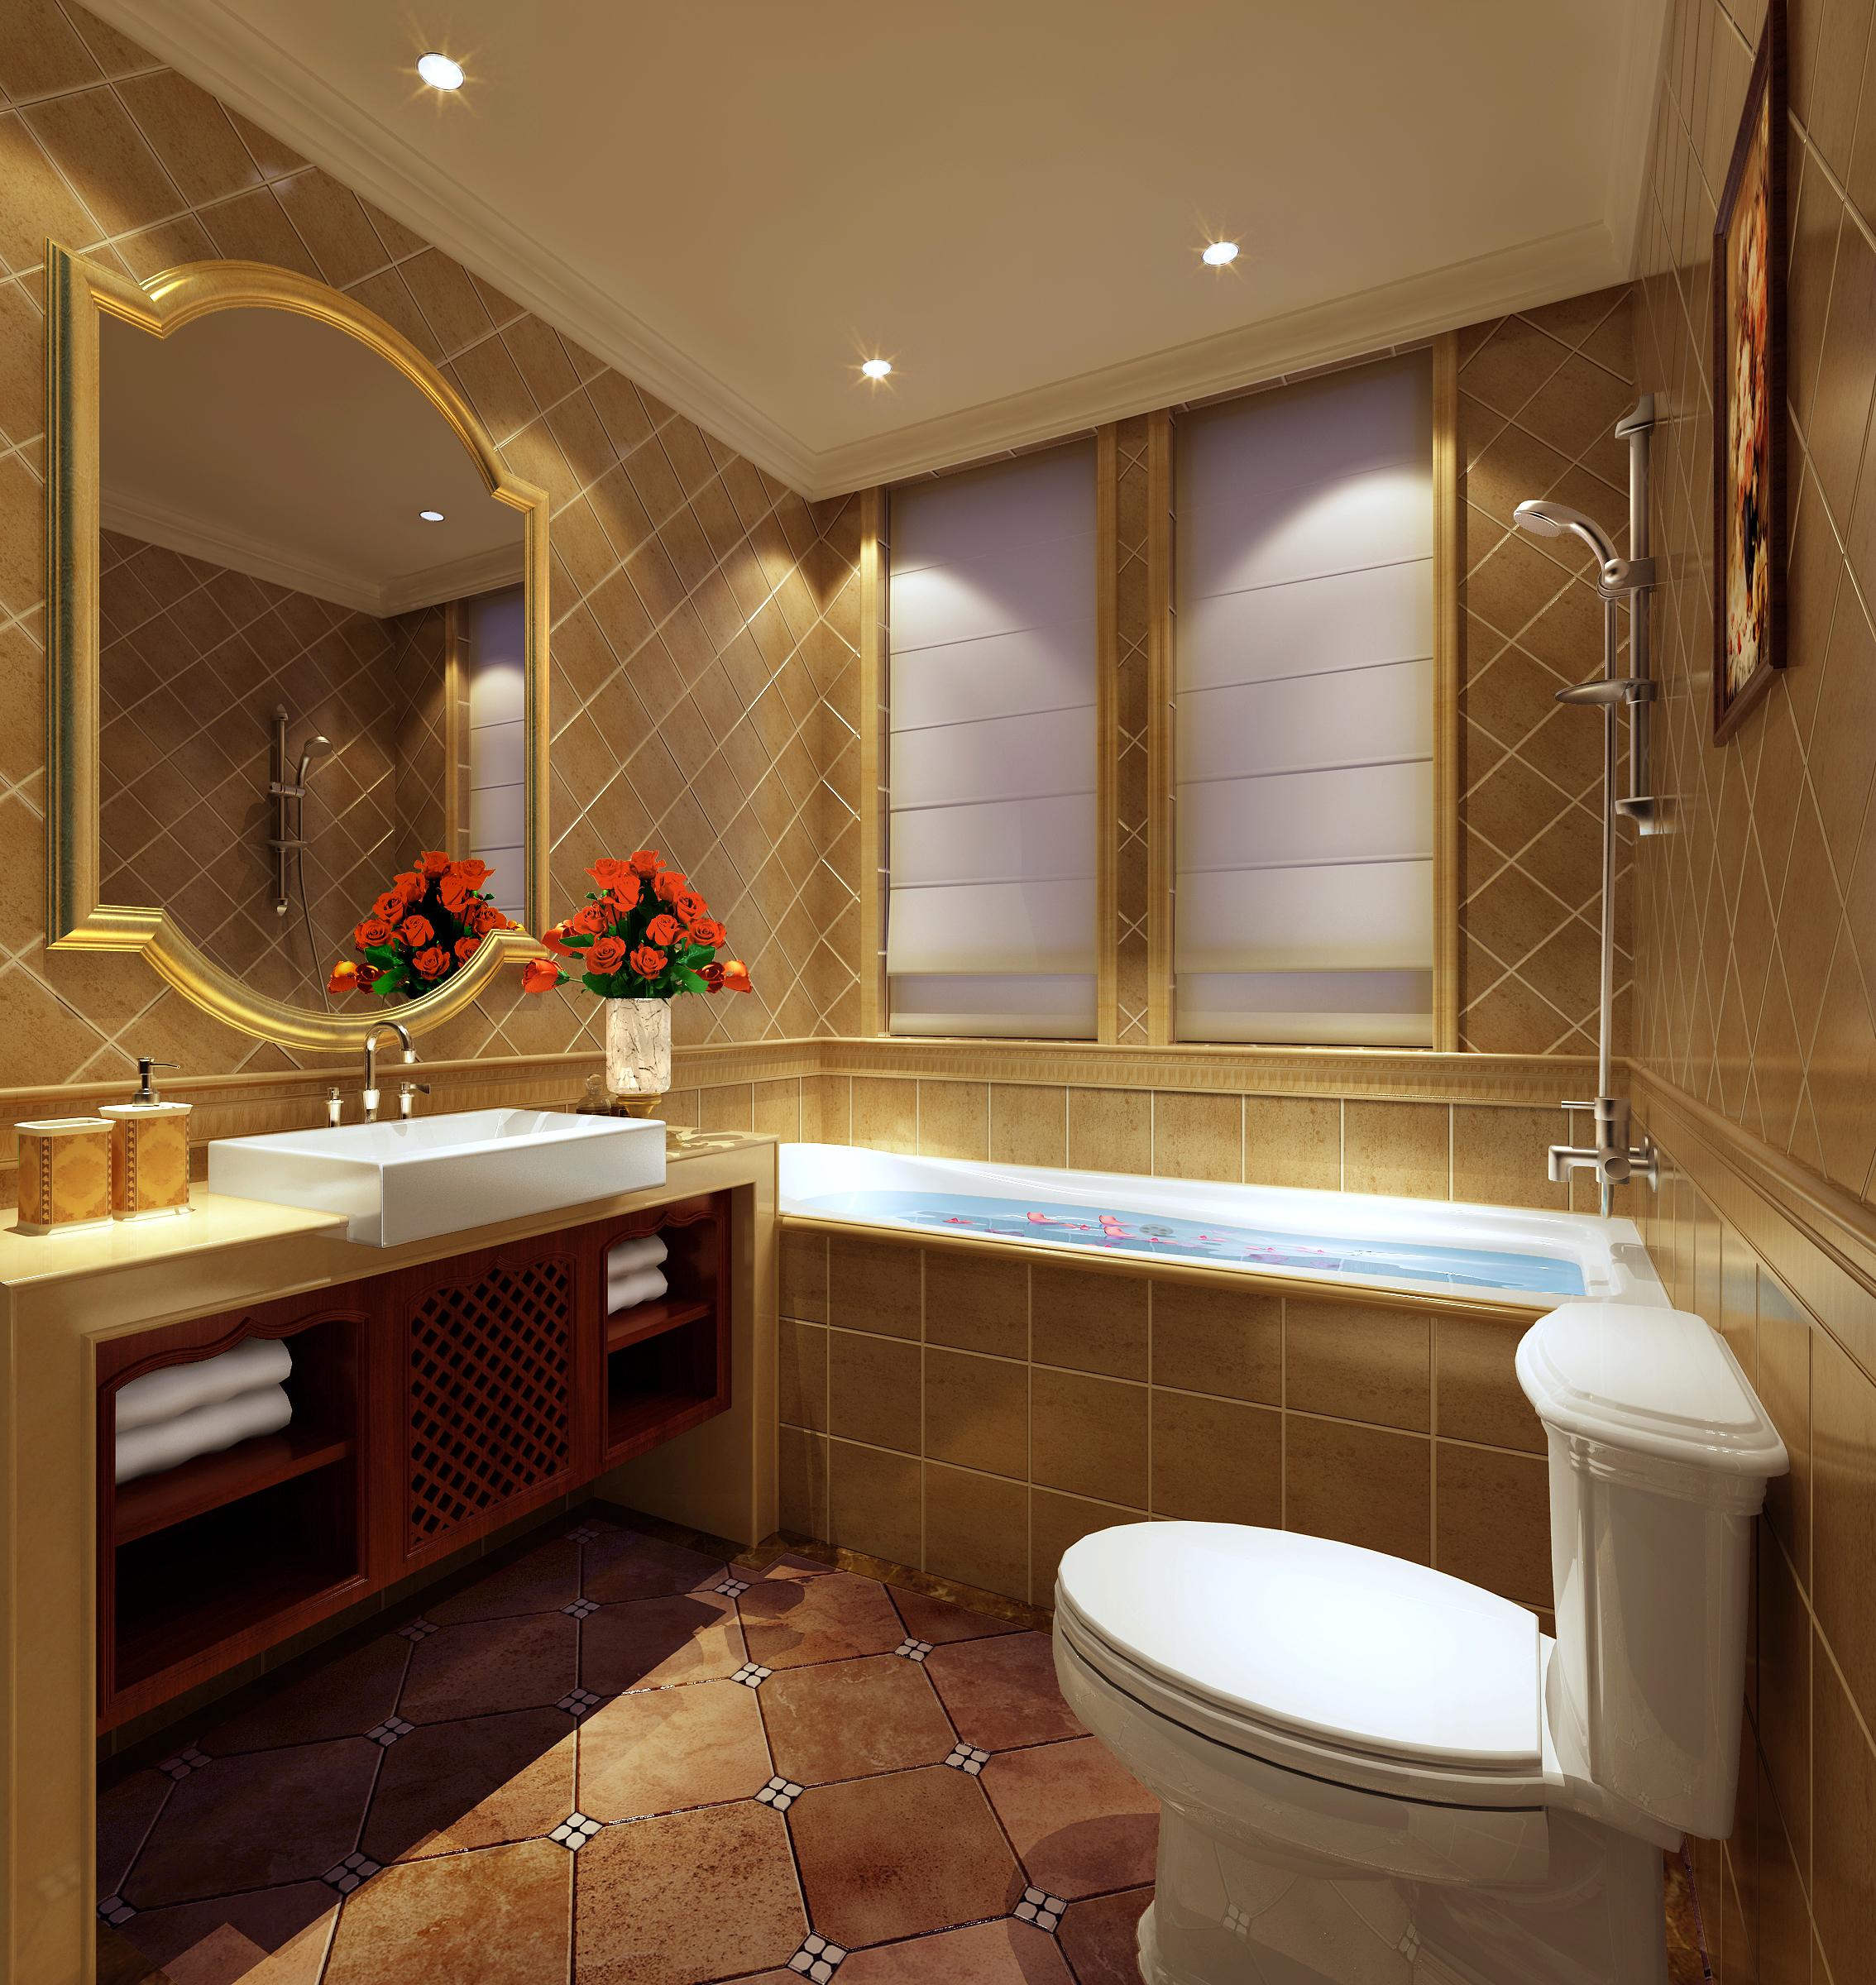 Classic Bathroom 3D Model .max - CGTrader.com on Bathroom Model Design  id=53253